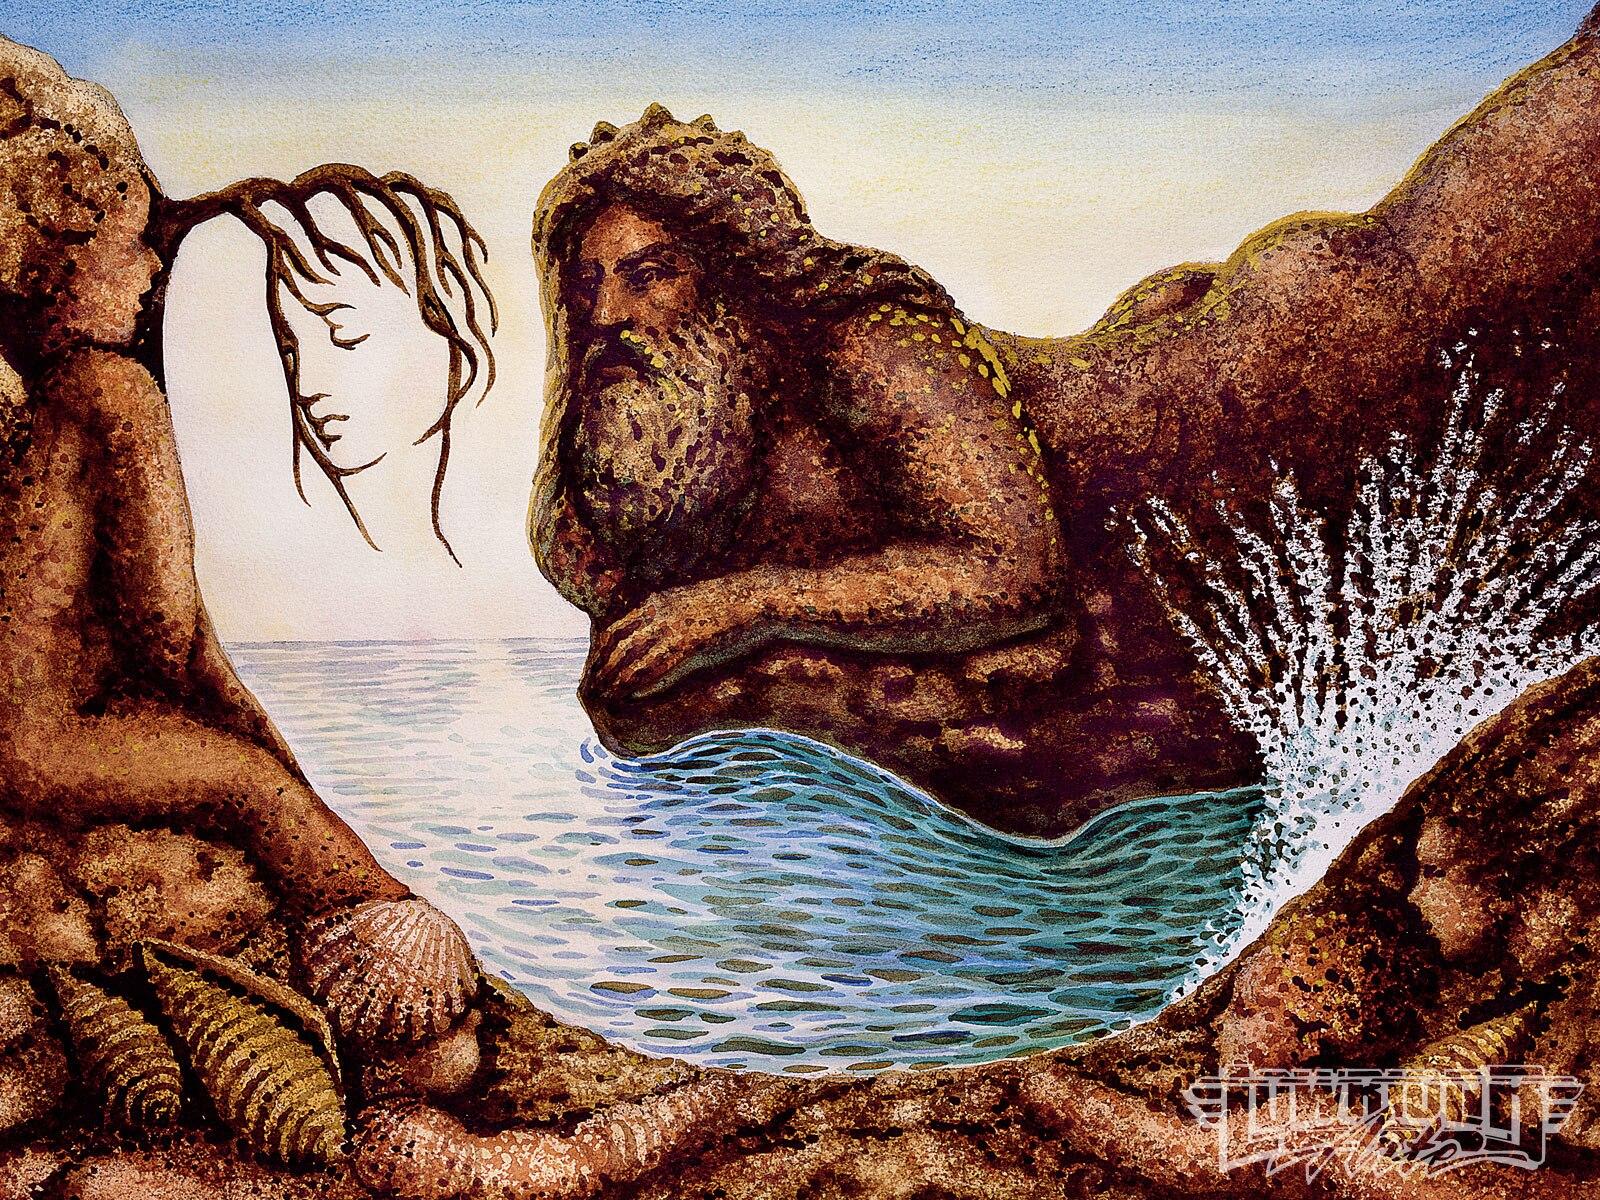 Octavio Ocampo - Metamorphosis Artist - Lowrider Arte Magazine